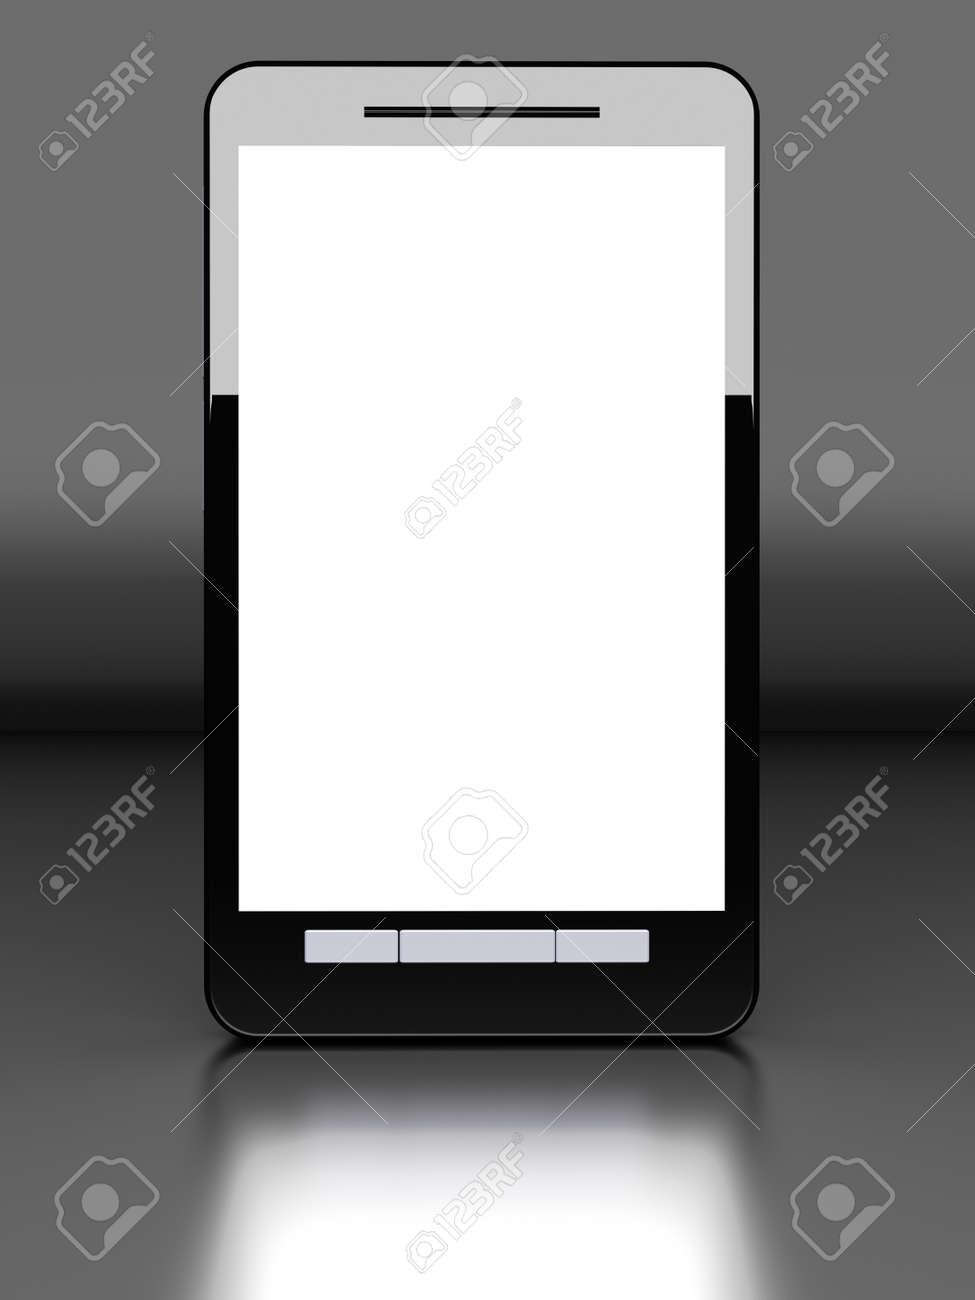 A modern Smartphone. 3D illustration. Stock Photo - 21471558